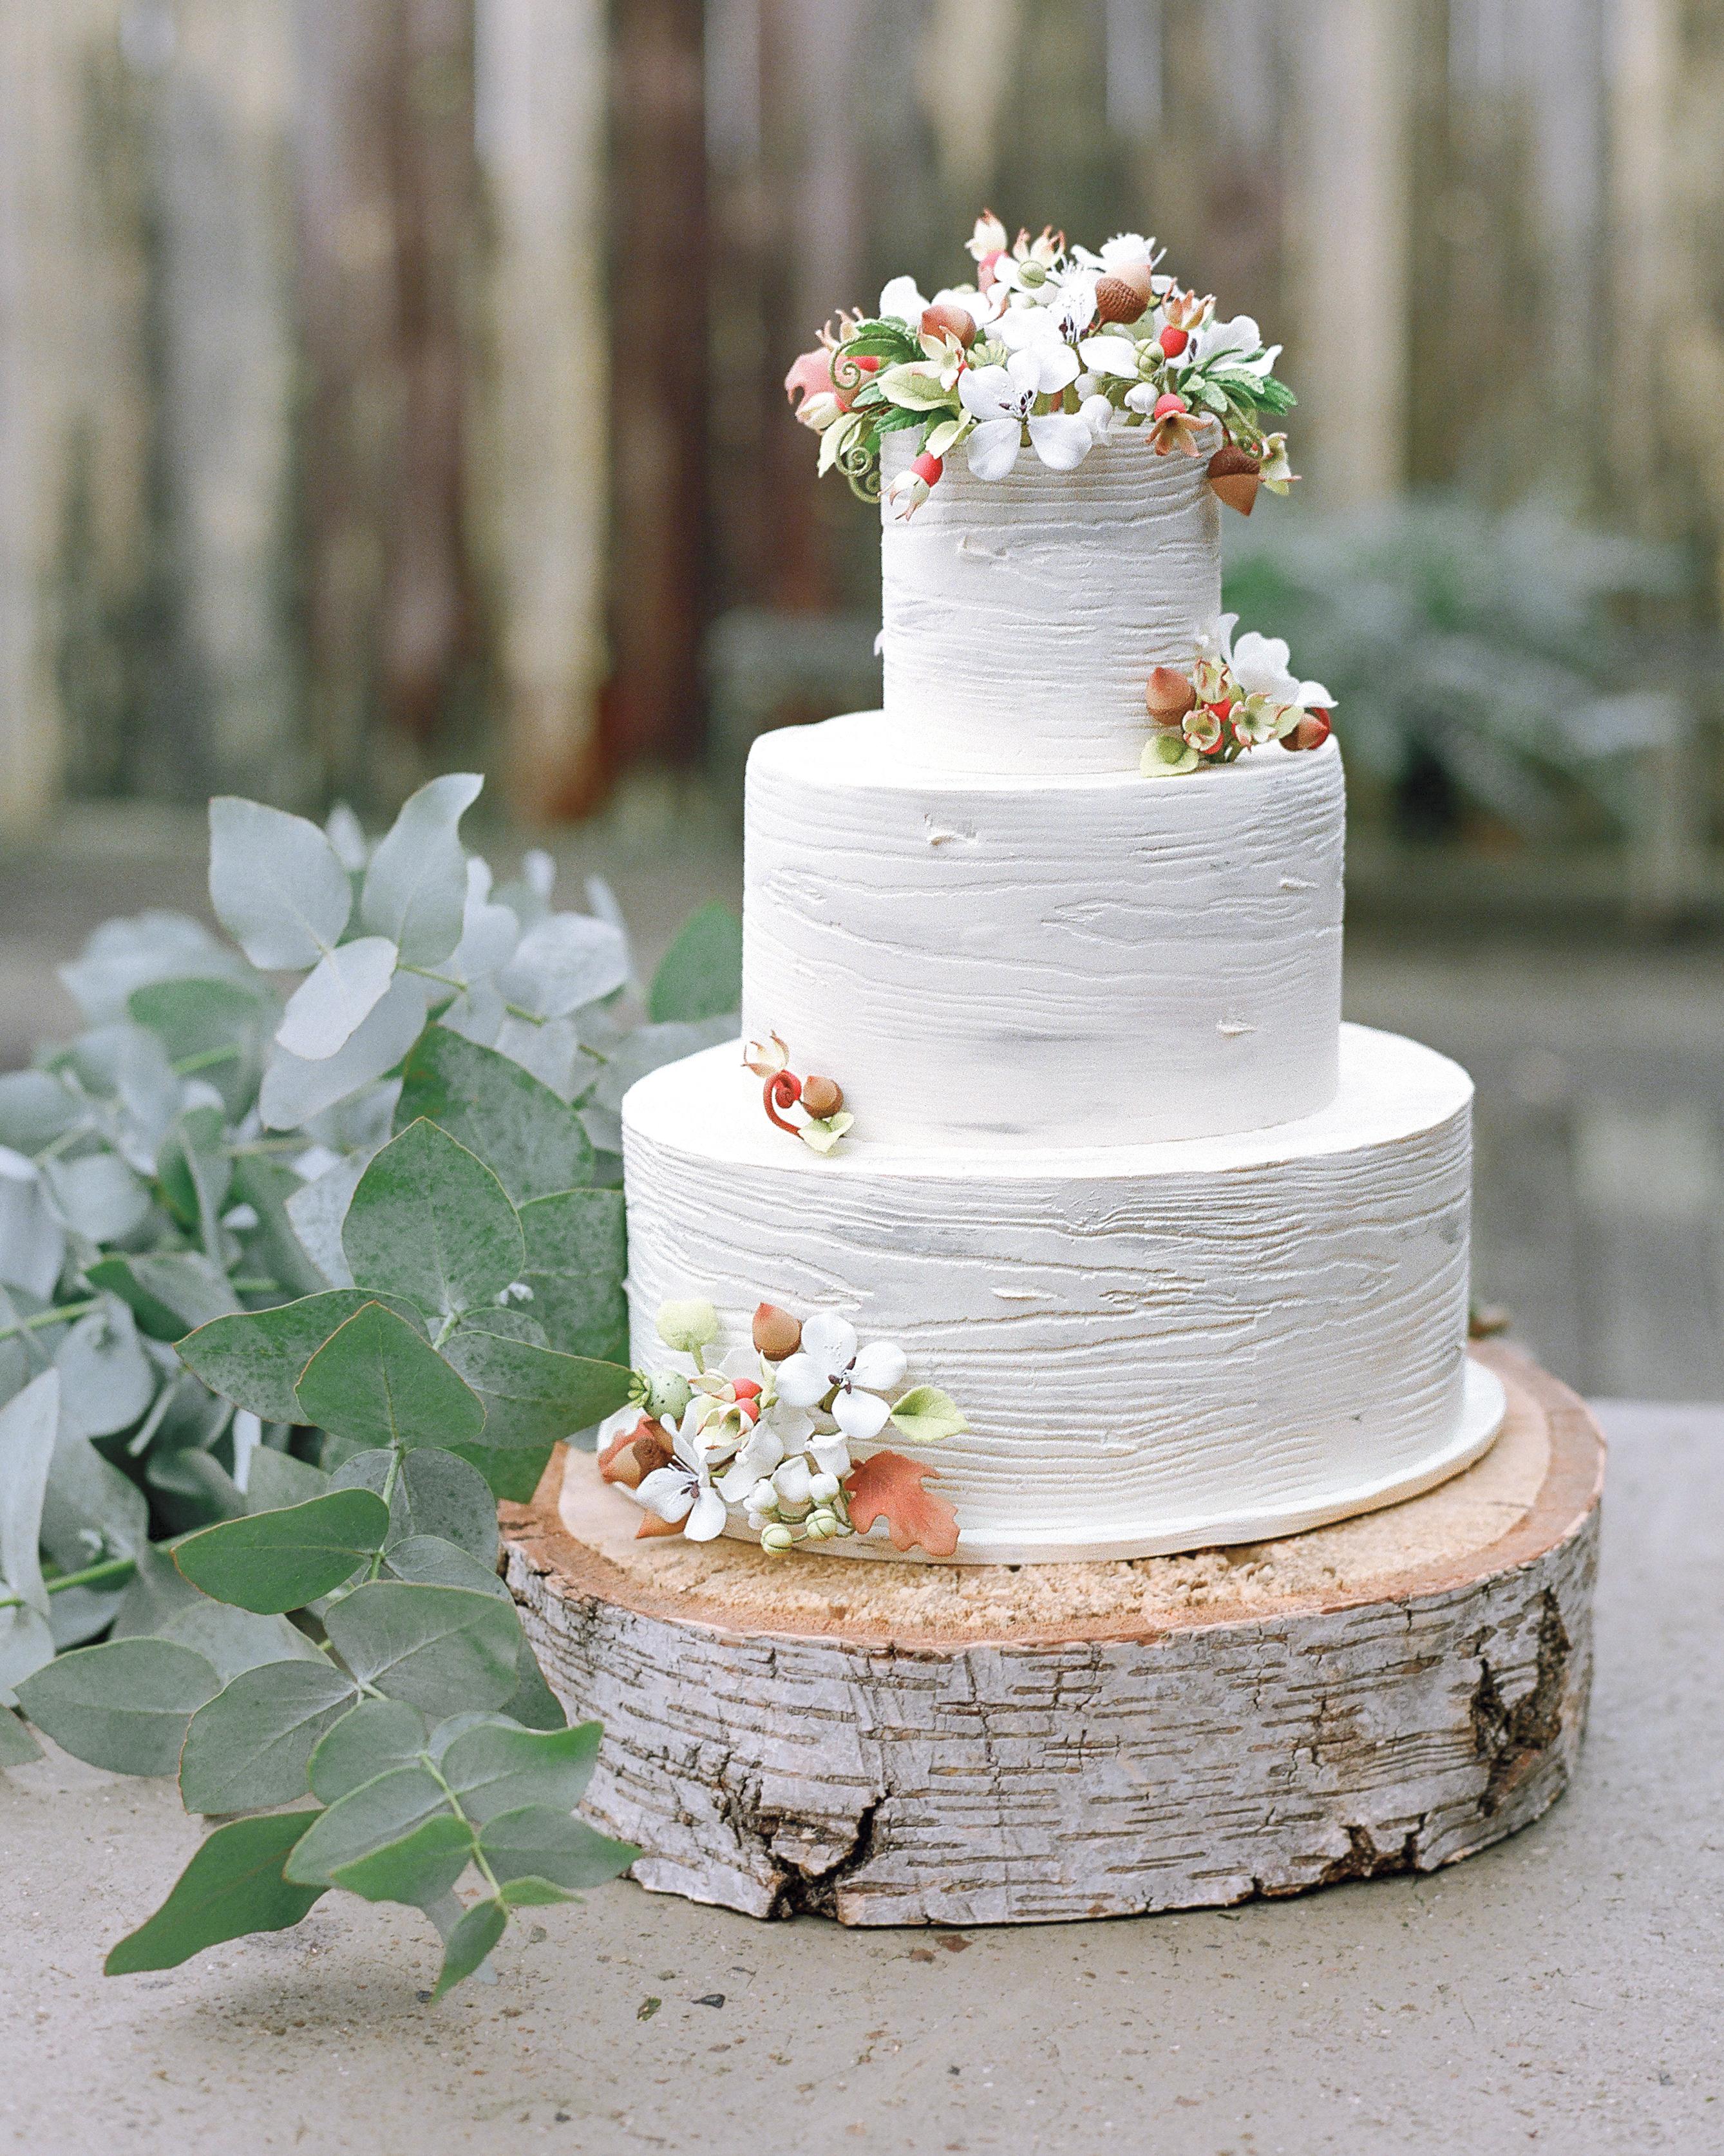 alison-markus-real-wedding-elizabeth-messina-033-ds111251.jpg